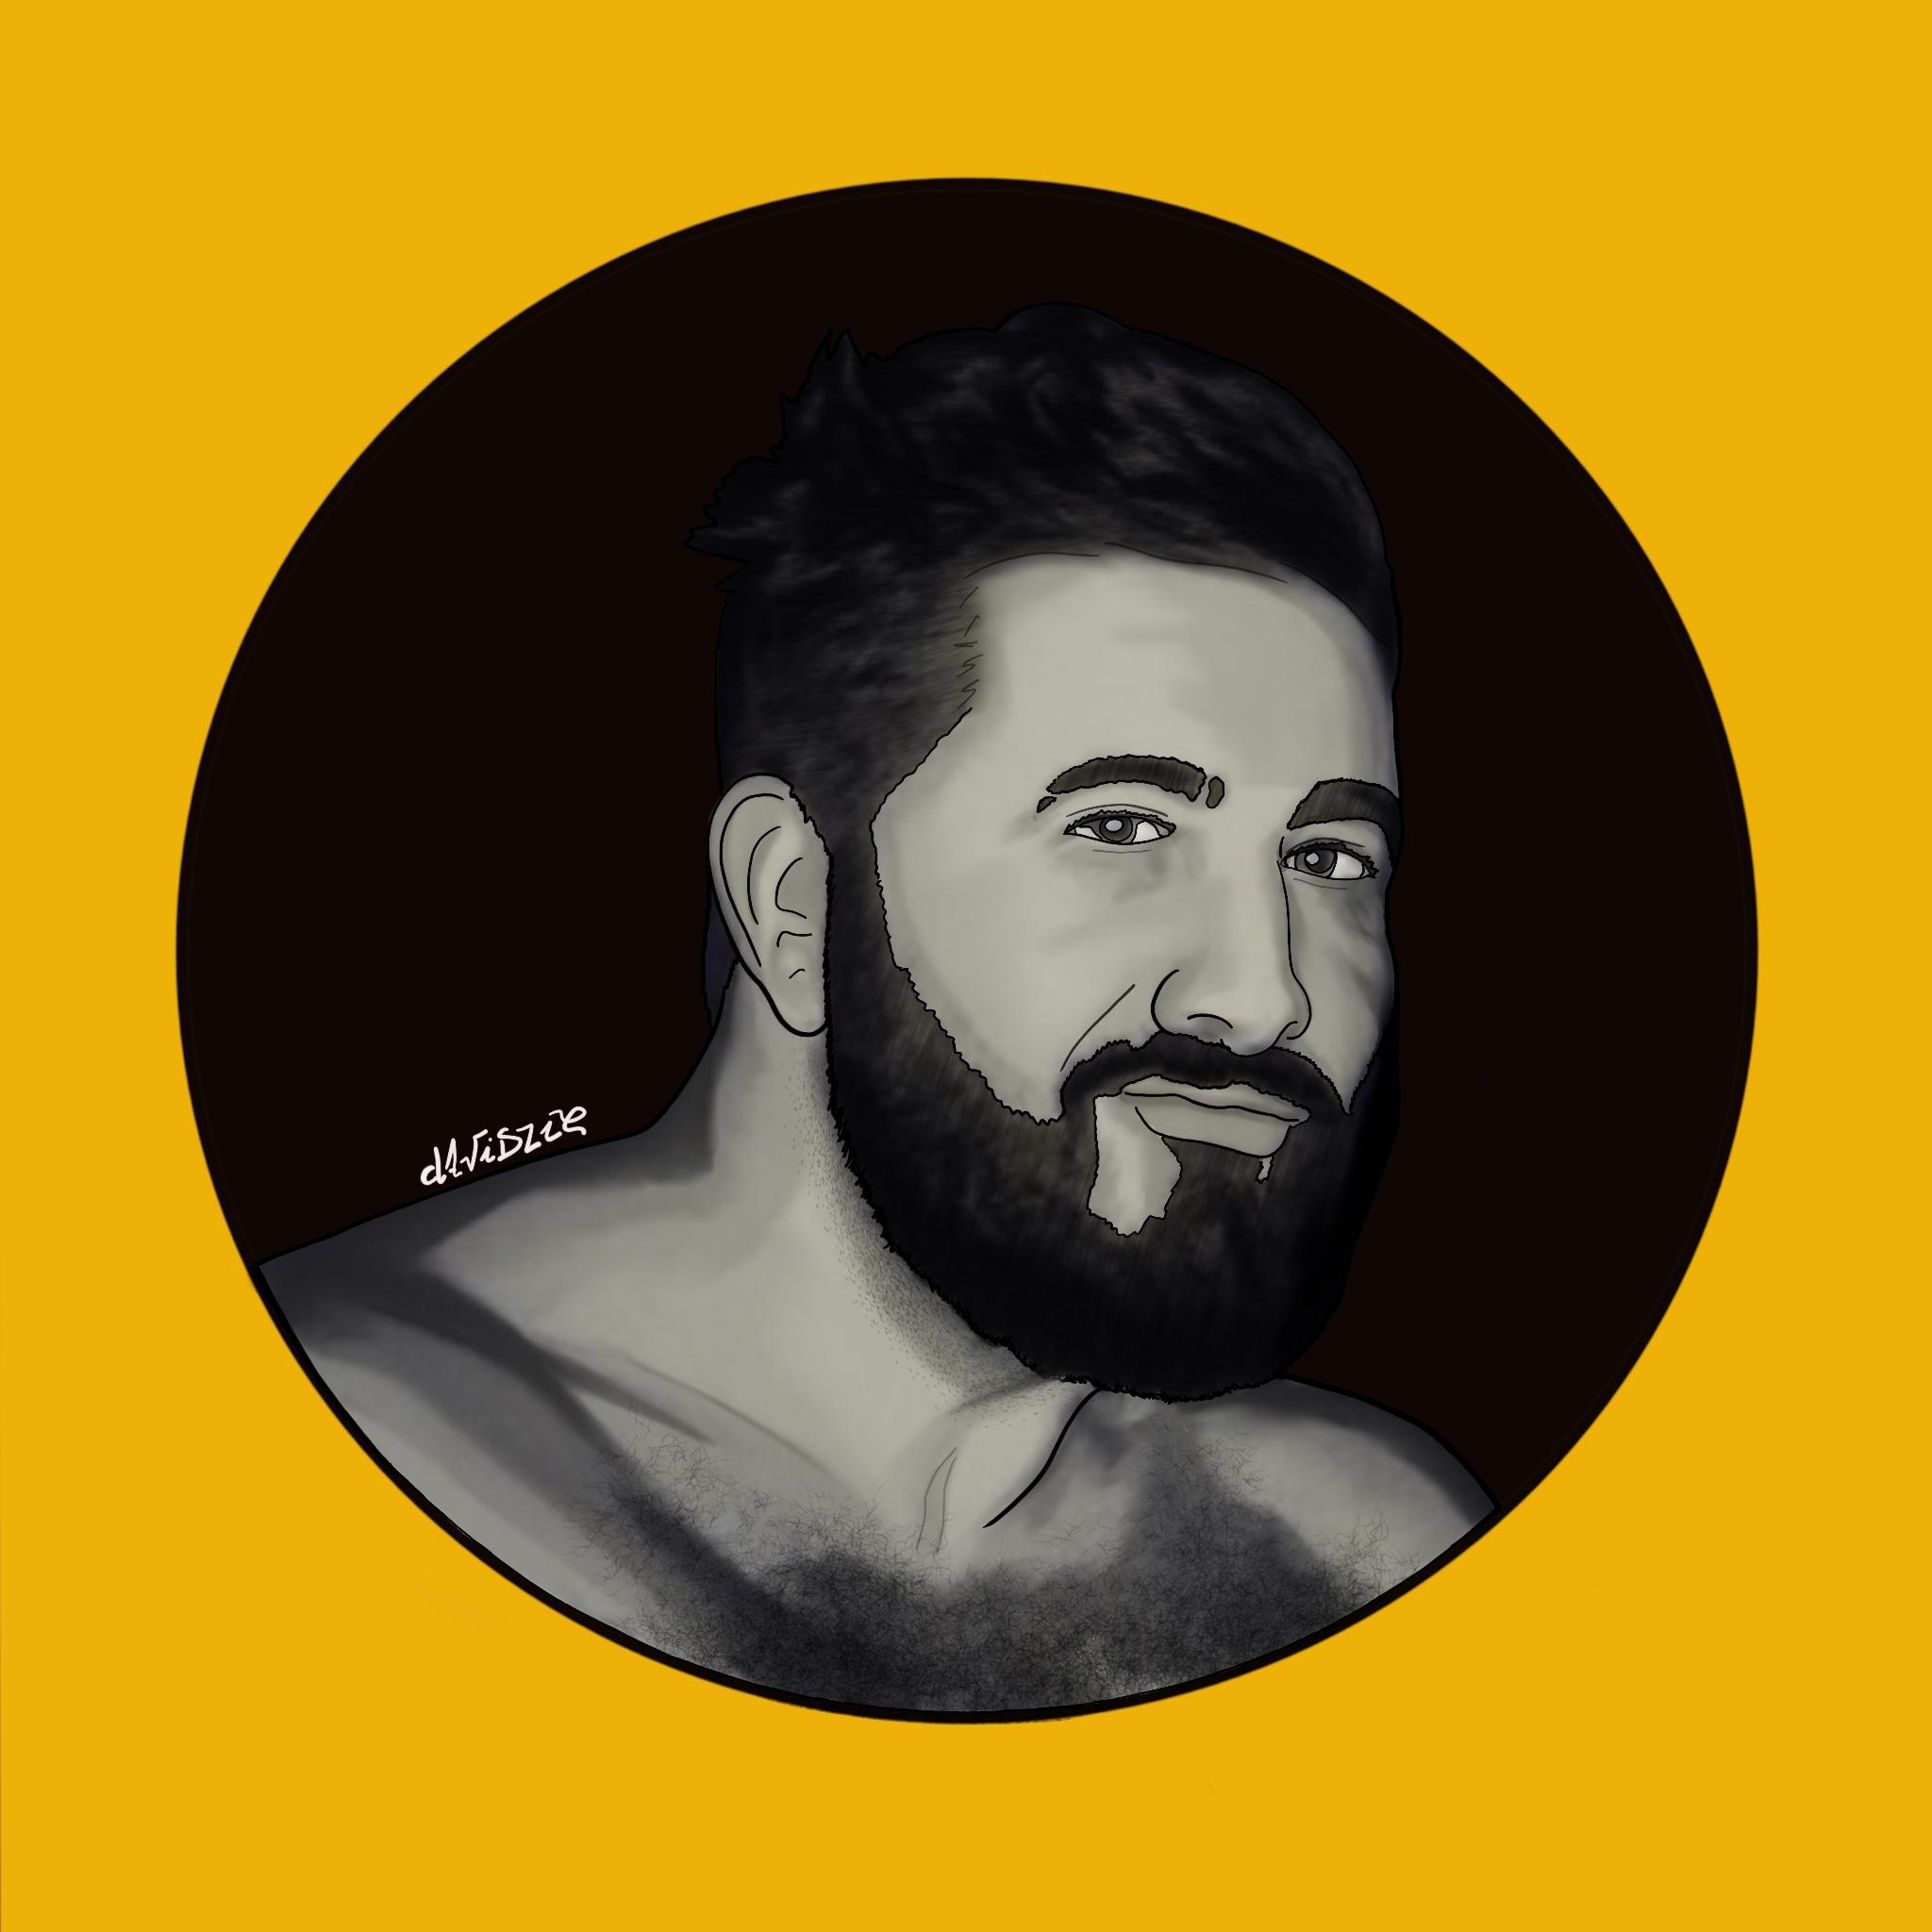 Retratos__David_Pallás_Gozalo_yellow_ava